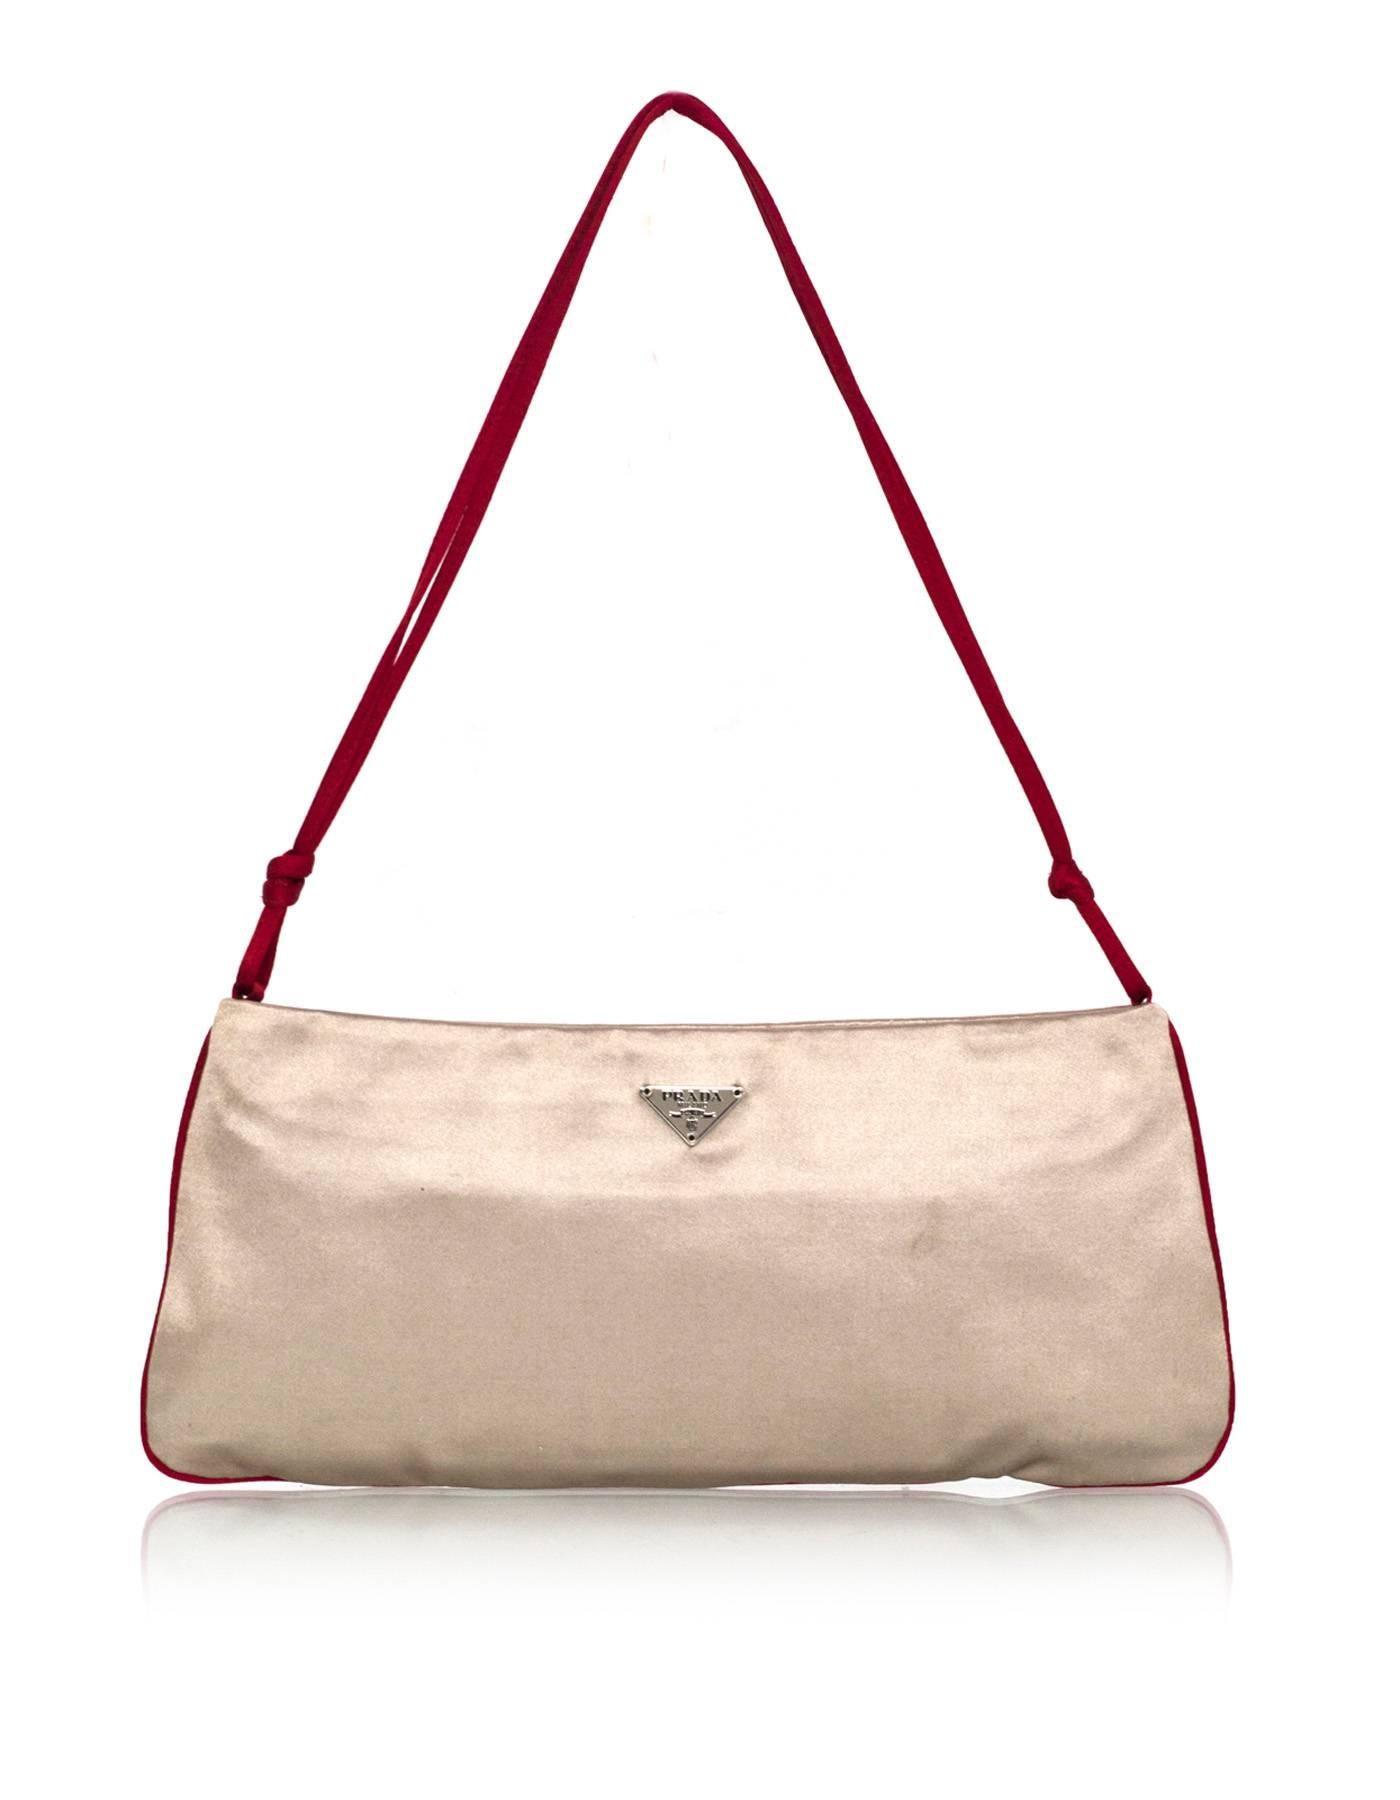 cb3d0bec08a2 buy prada saffiano mini bags replica cdd7f 8b5b8; purchase prada champagne  and red satin beaded pochette bag for sale at 1stdibs 0fd2c 4c8c4